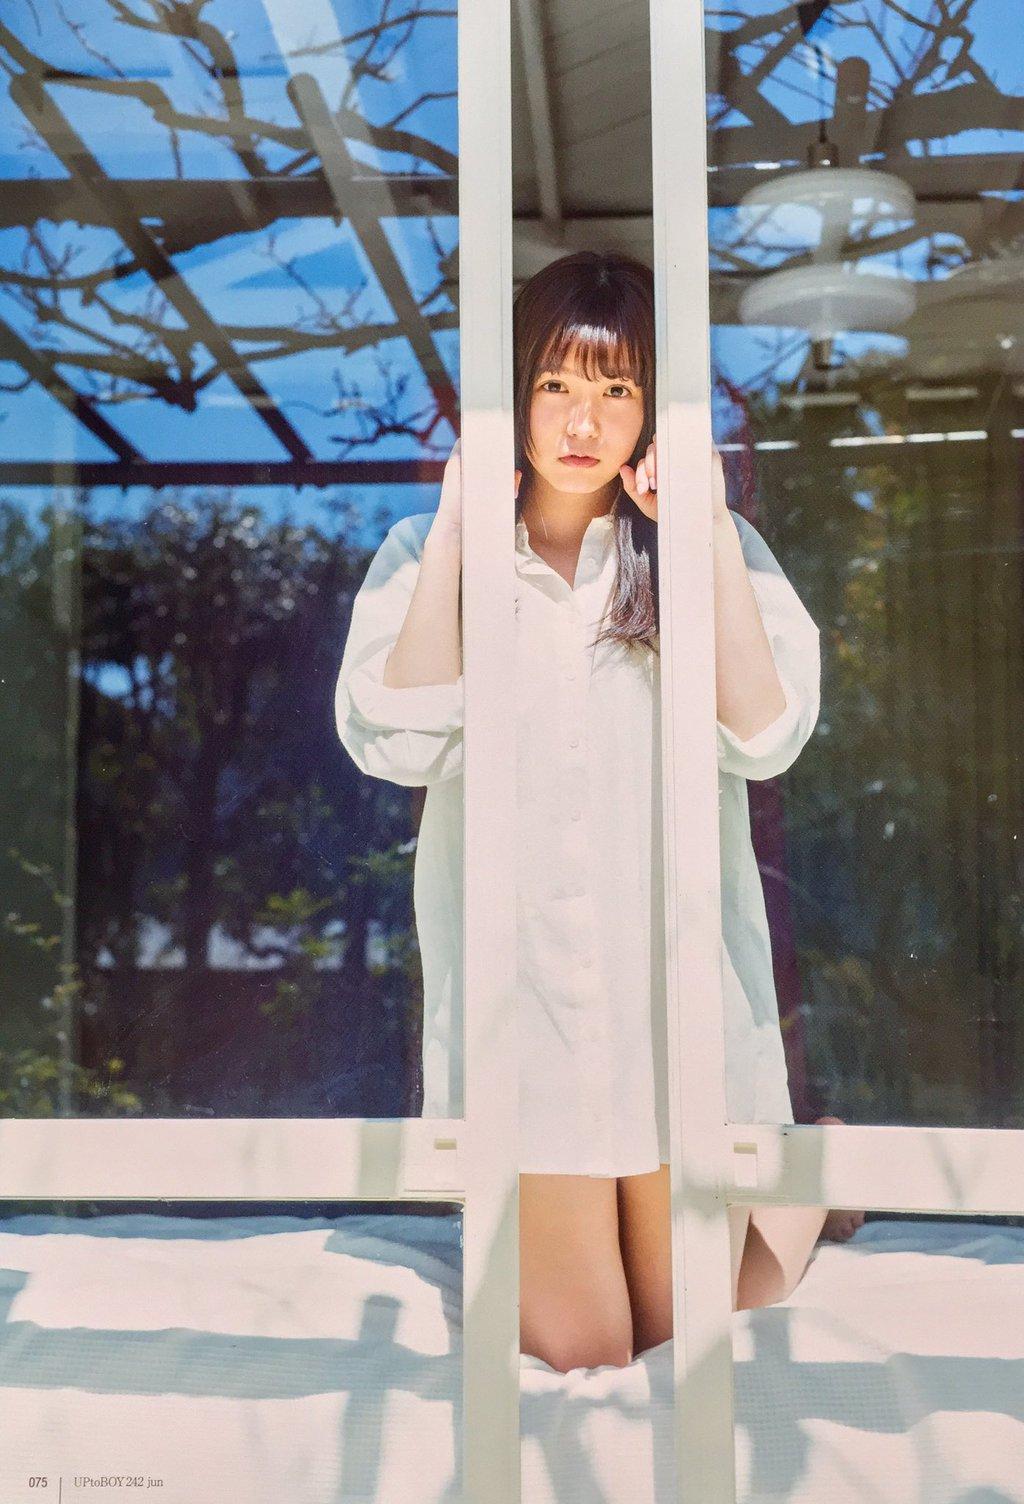 Nakamoto Himeka 中元日芽香 Nogizaka46 UTB Magazine Vol.242 June 2016 Gravure